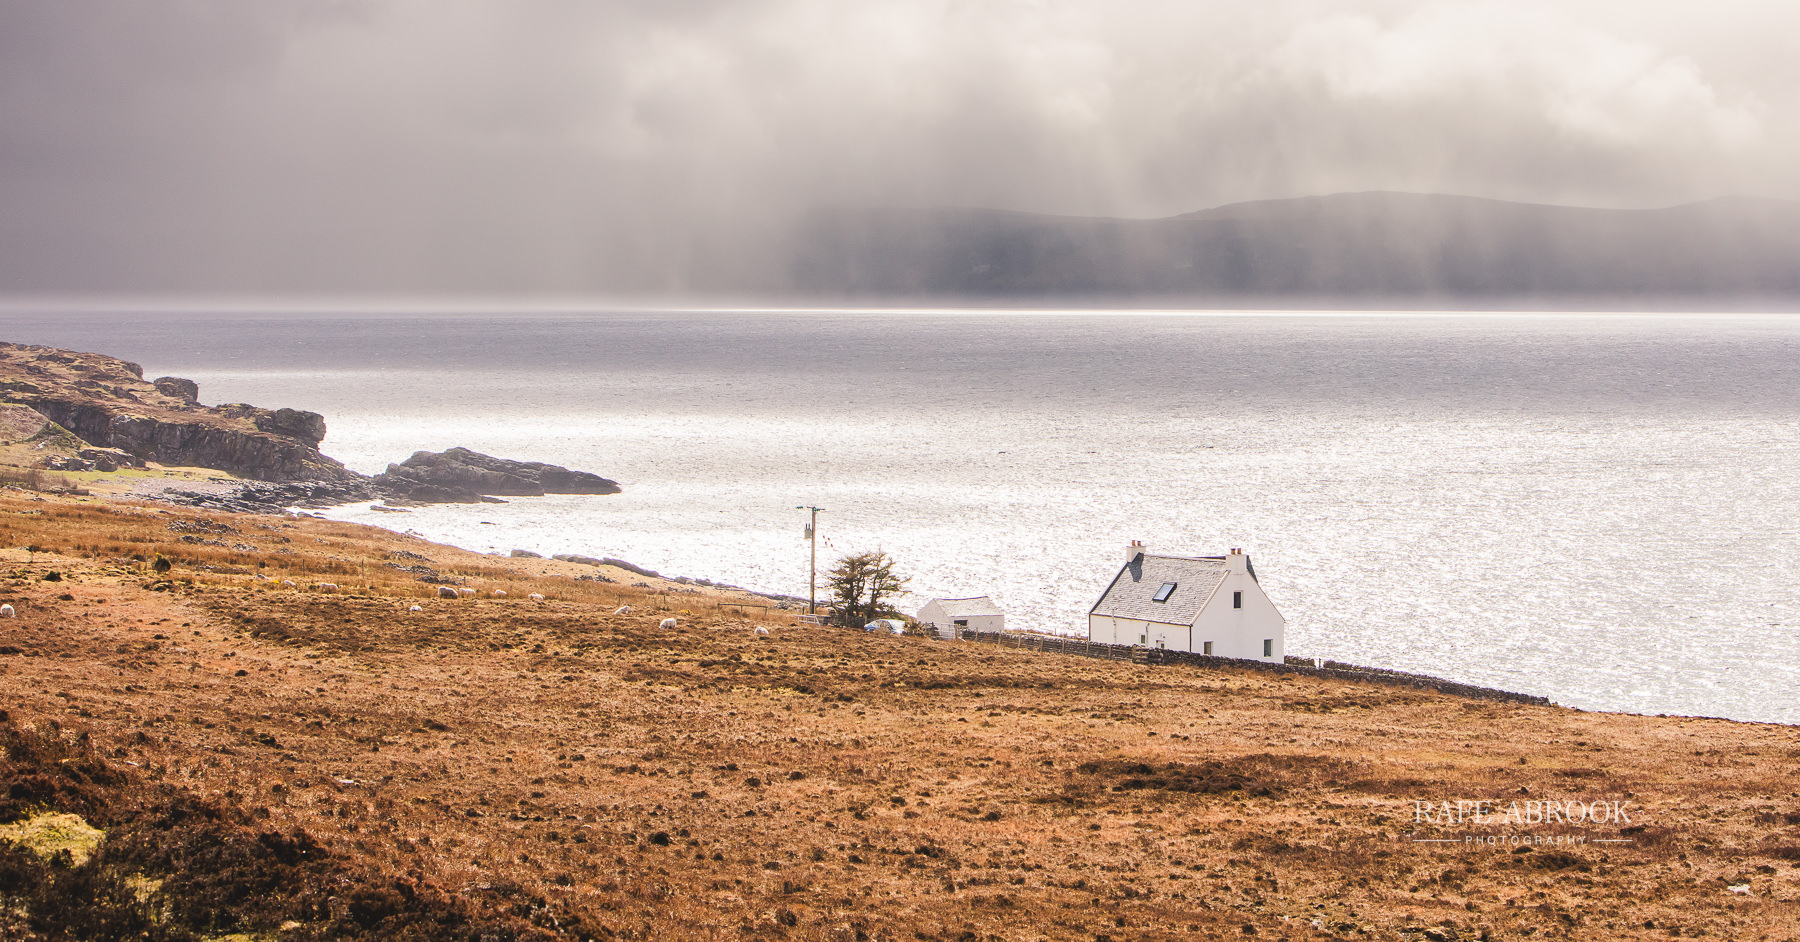 north coast 500 scotland porsche cayman gt4 golf r estate rafe abrook photography-1328.jpg